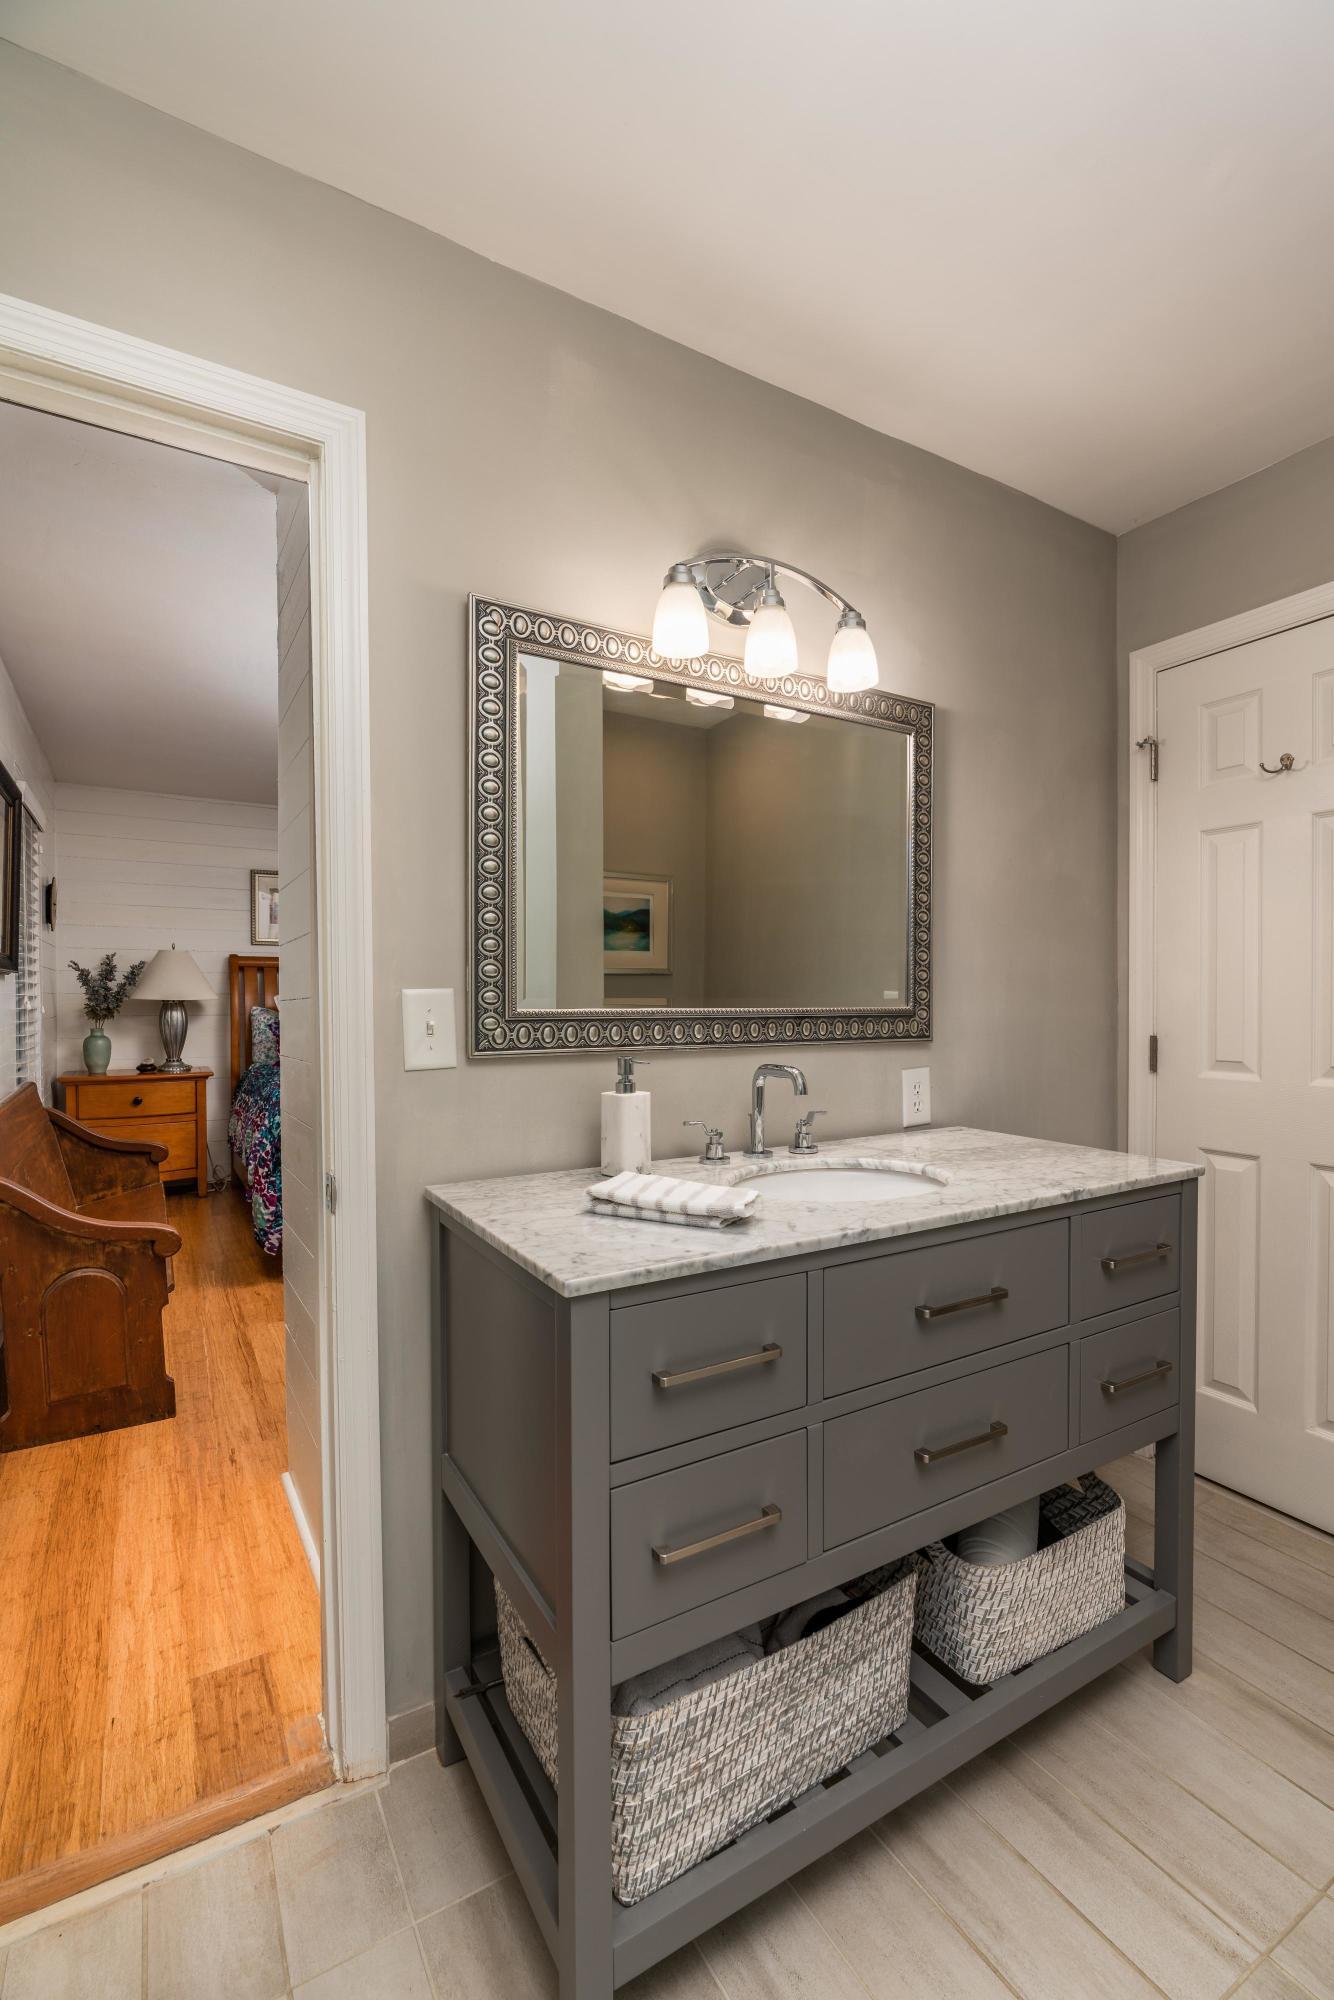 White Point Estates Homes For Sale - 894 White Point, Charleston, SC - 25